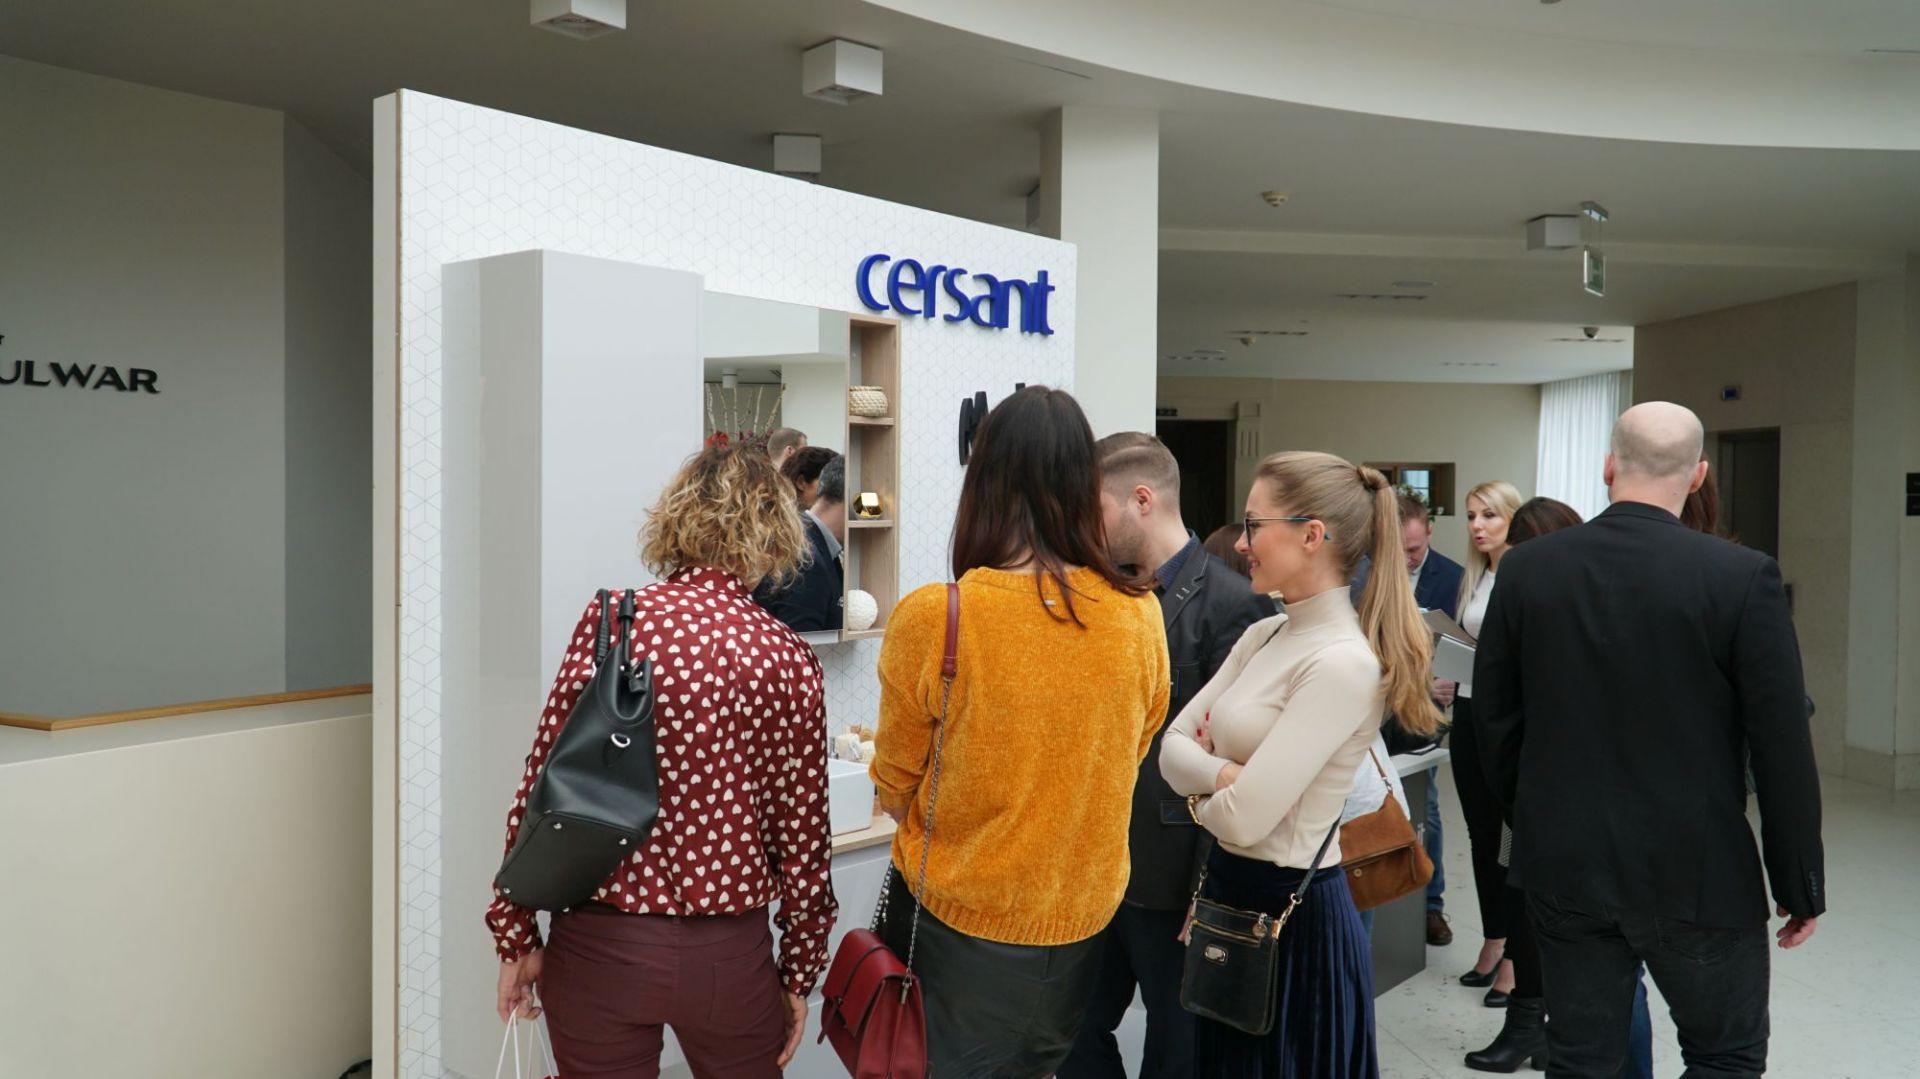 SDR Toruń, stoisko firmy Cersanit